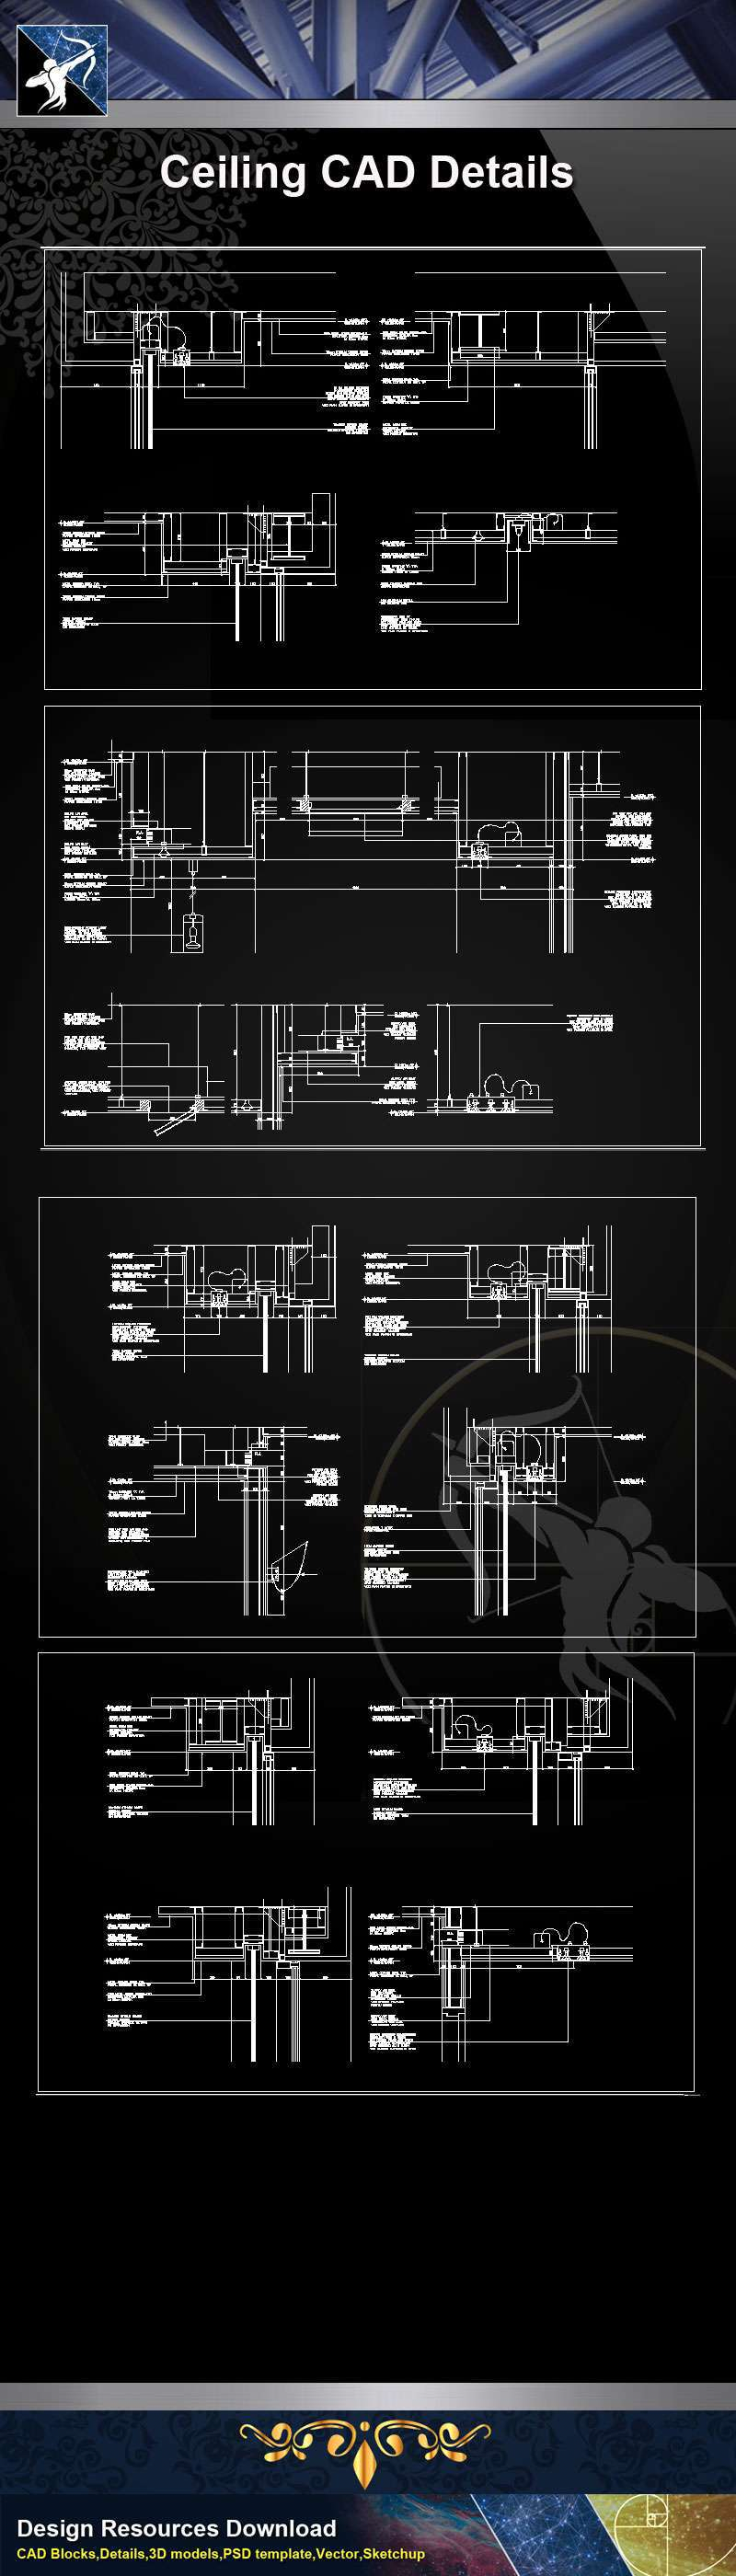 【Architecture CAD Details Collections】Ceiling Design CAD Details V.2